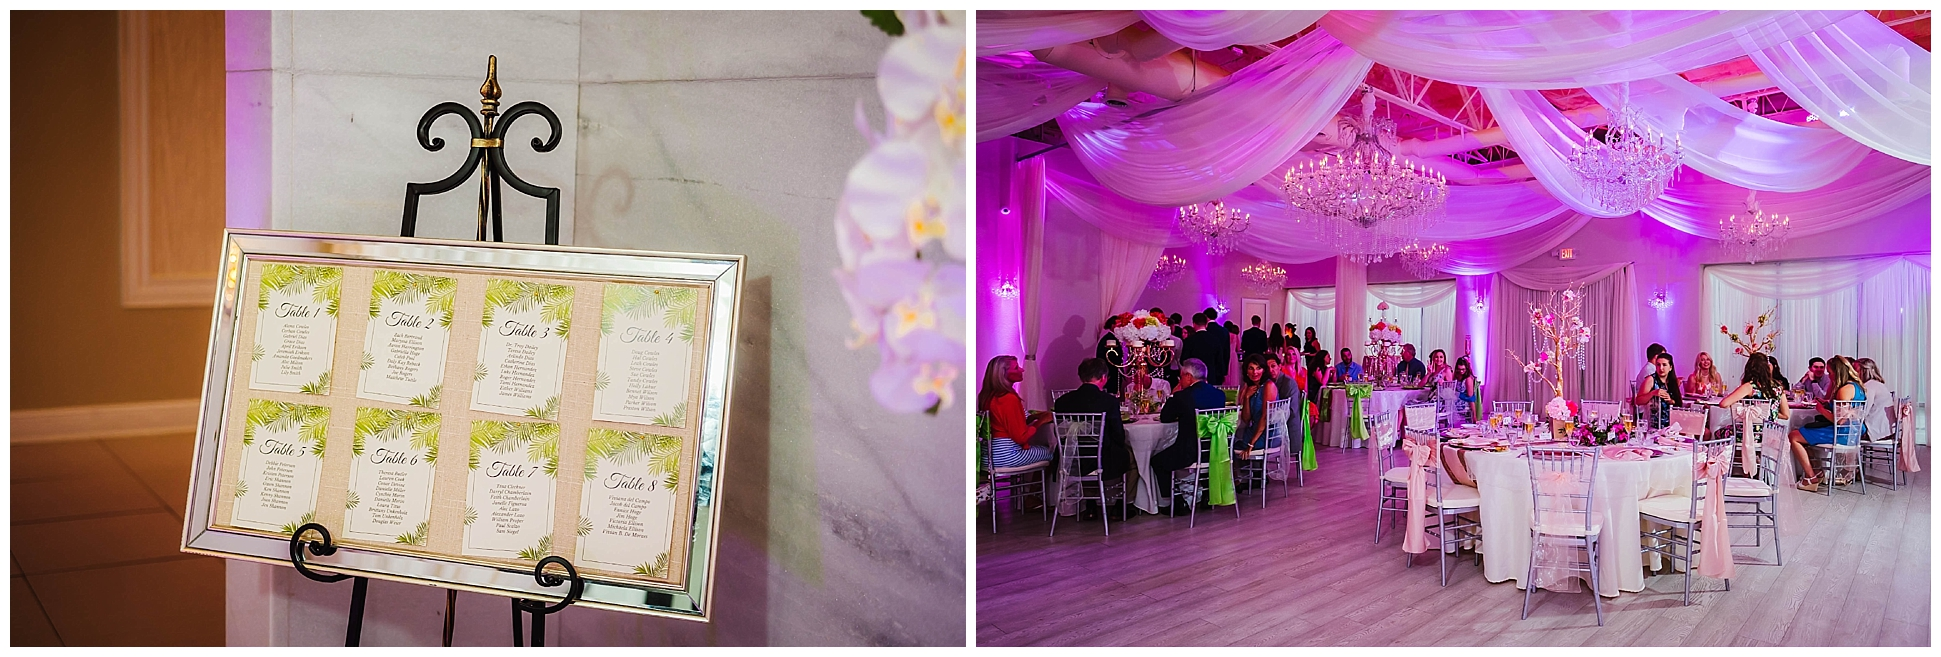 st-pete-wedding-photographer-sunken-gardens-crystal-ballroom-princess-dancer_0183.jpg